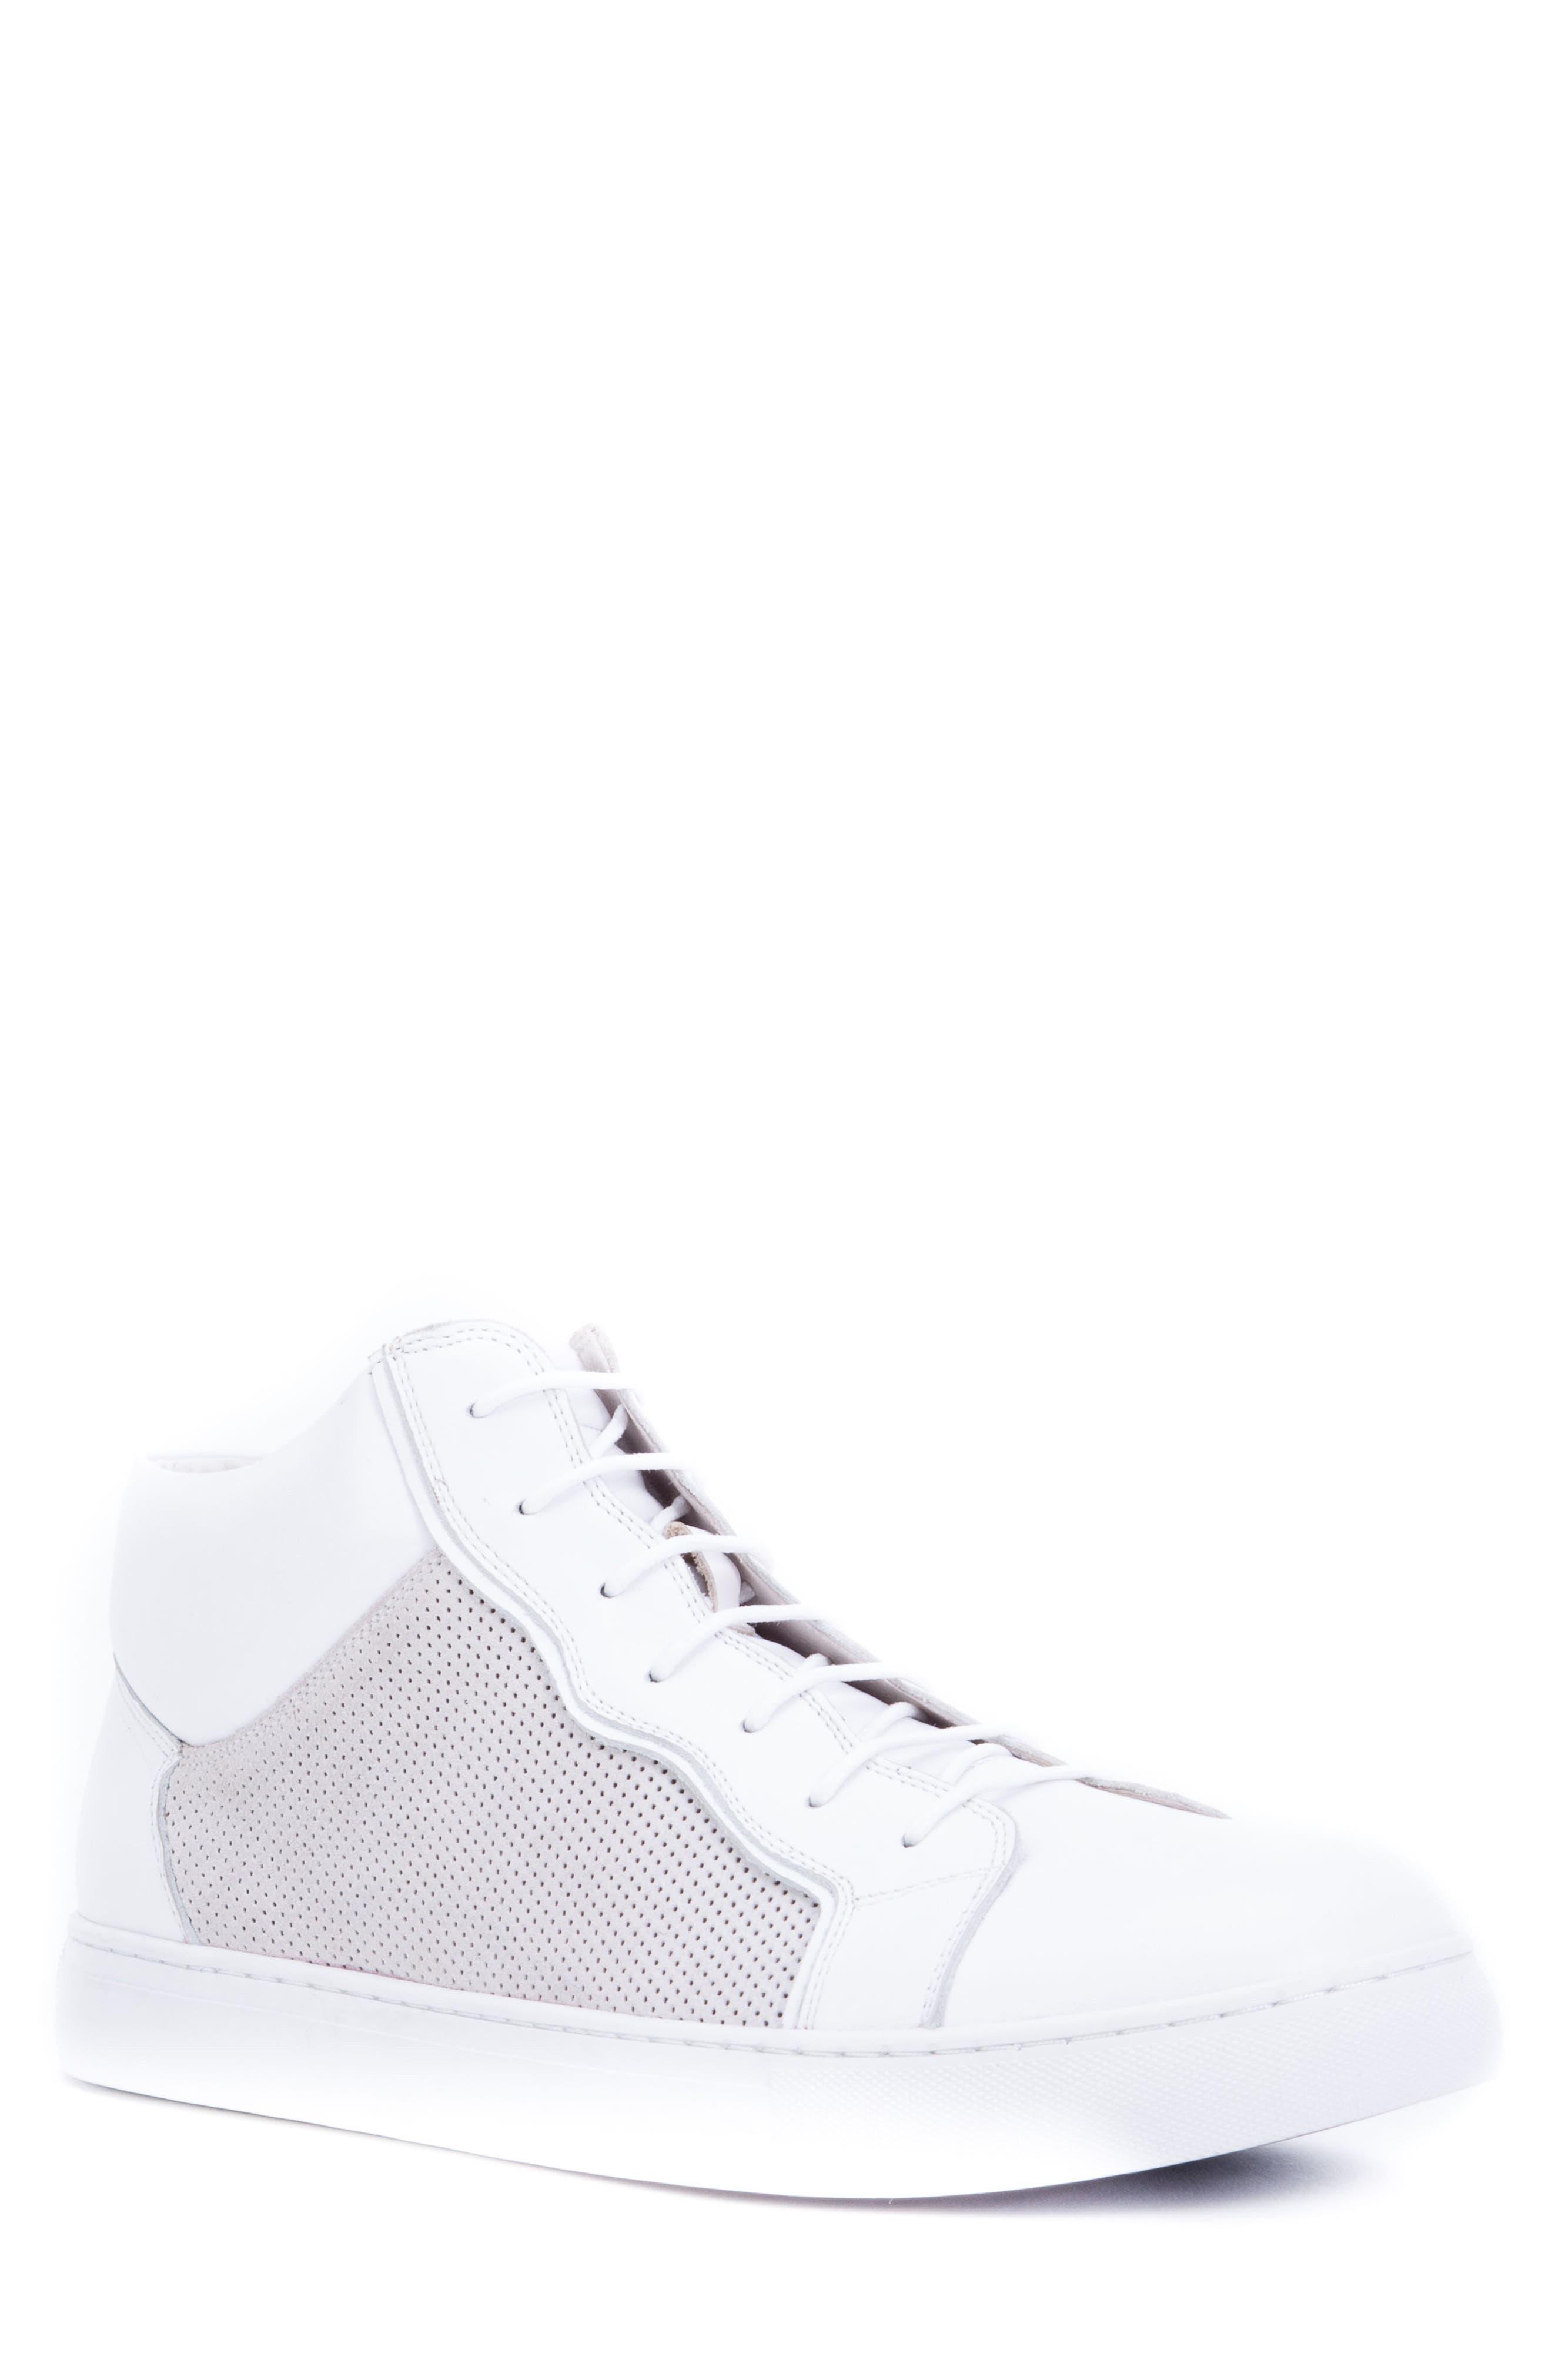 Zanzara Twist Perforated High Top Sneaker, White